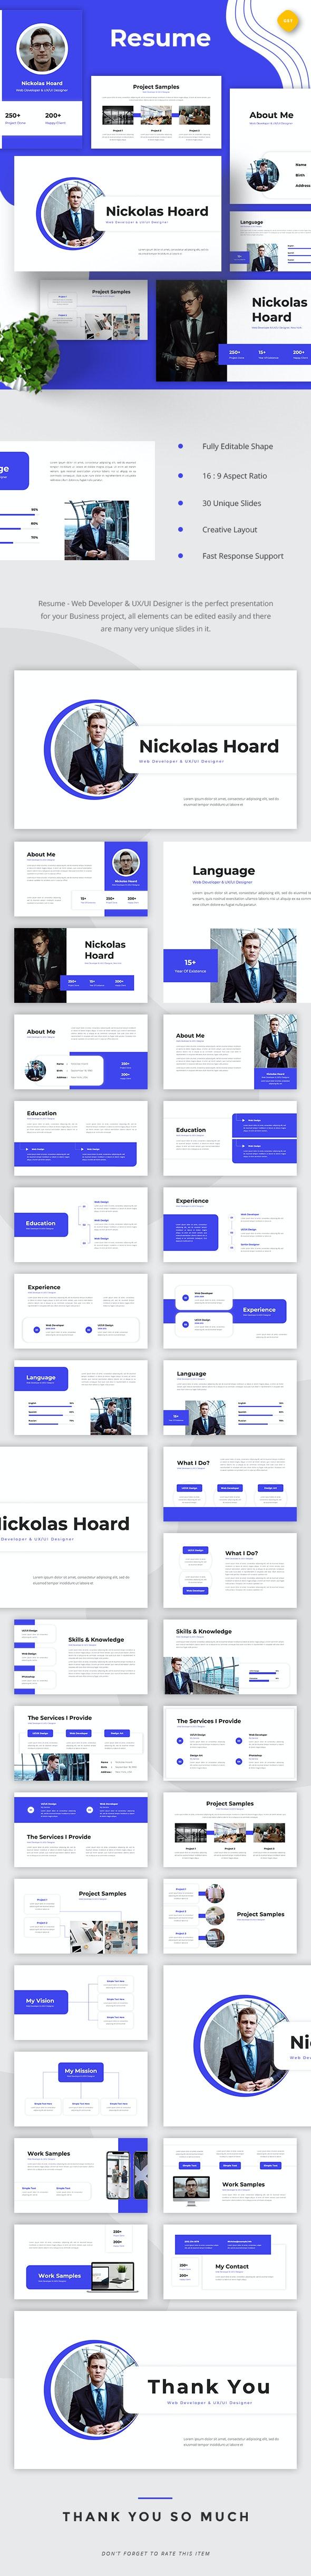 Resume Web Developer & UI/UX Designer Google Slides Google Slides - Google Slides Presentation Templates